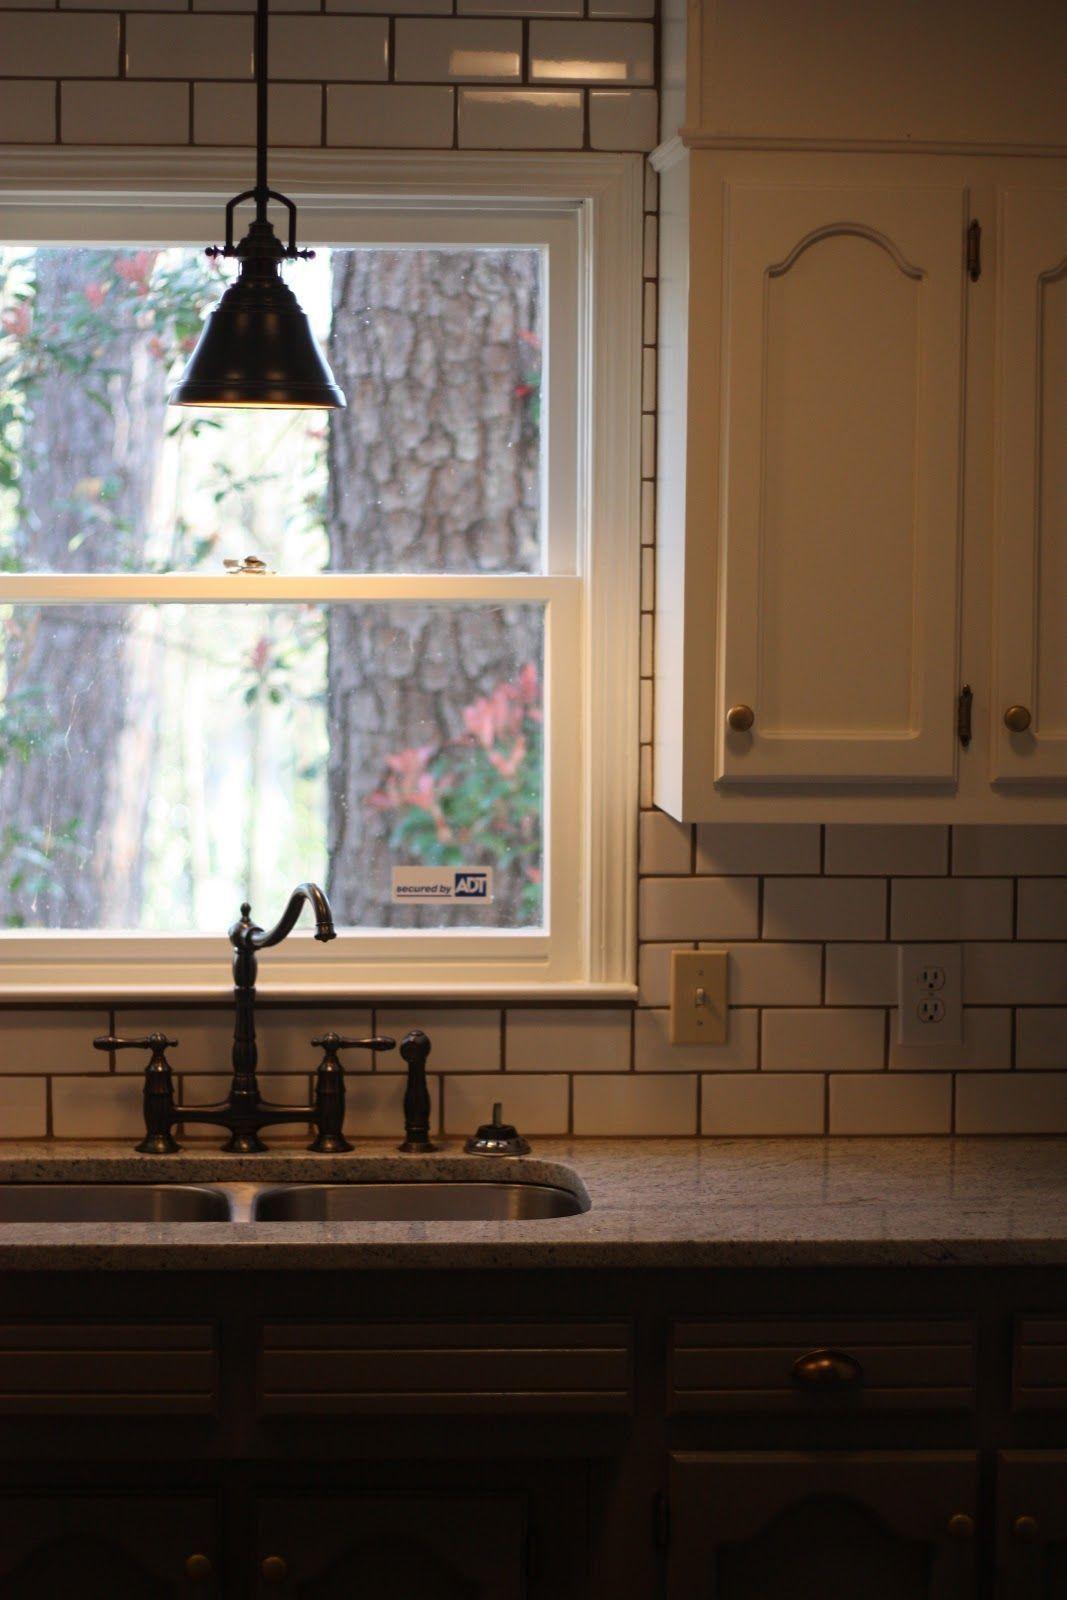 Kitchen Lighting Sink Kitcheninteriordesign Kitcheninspiration